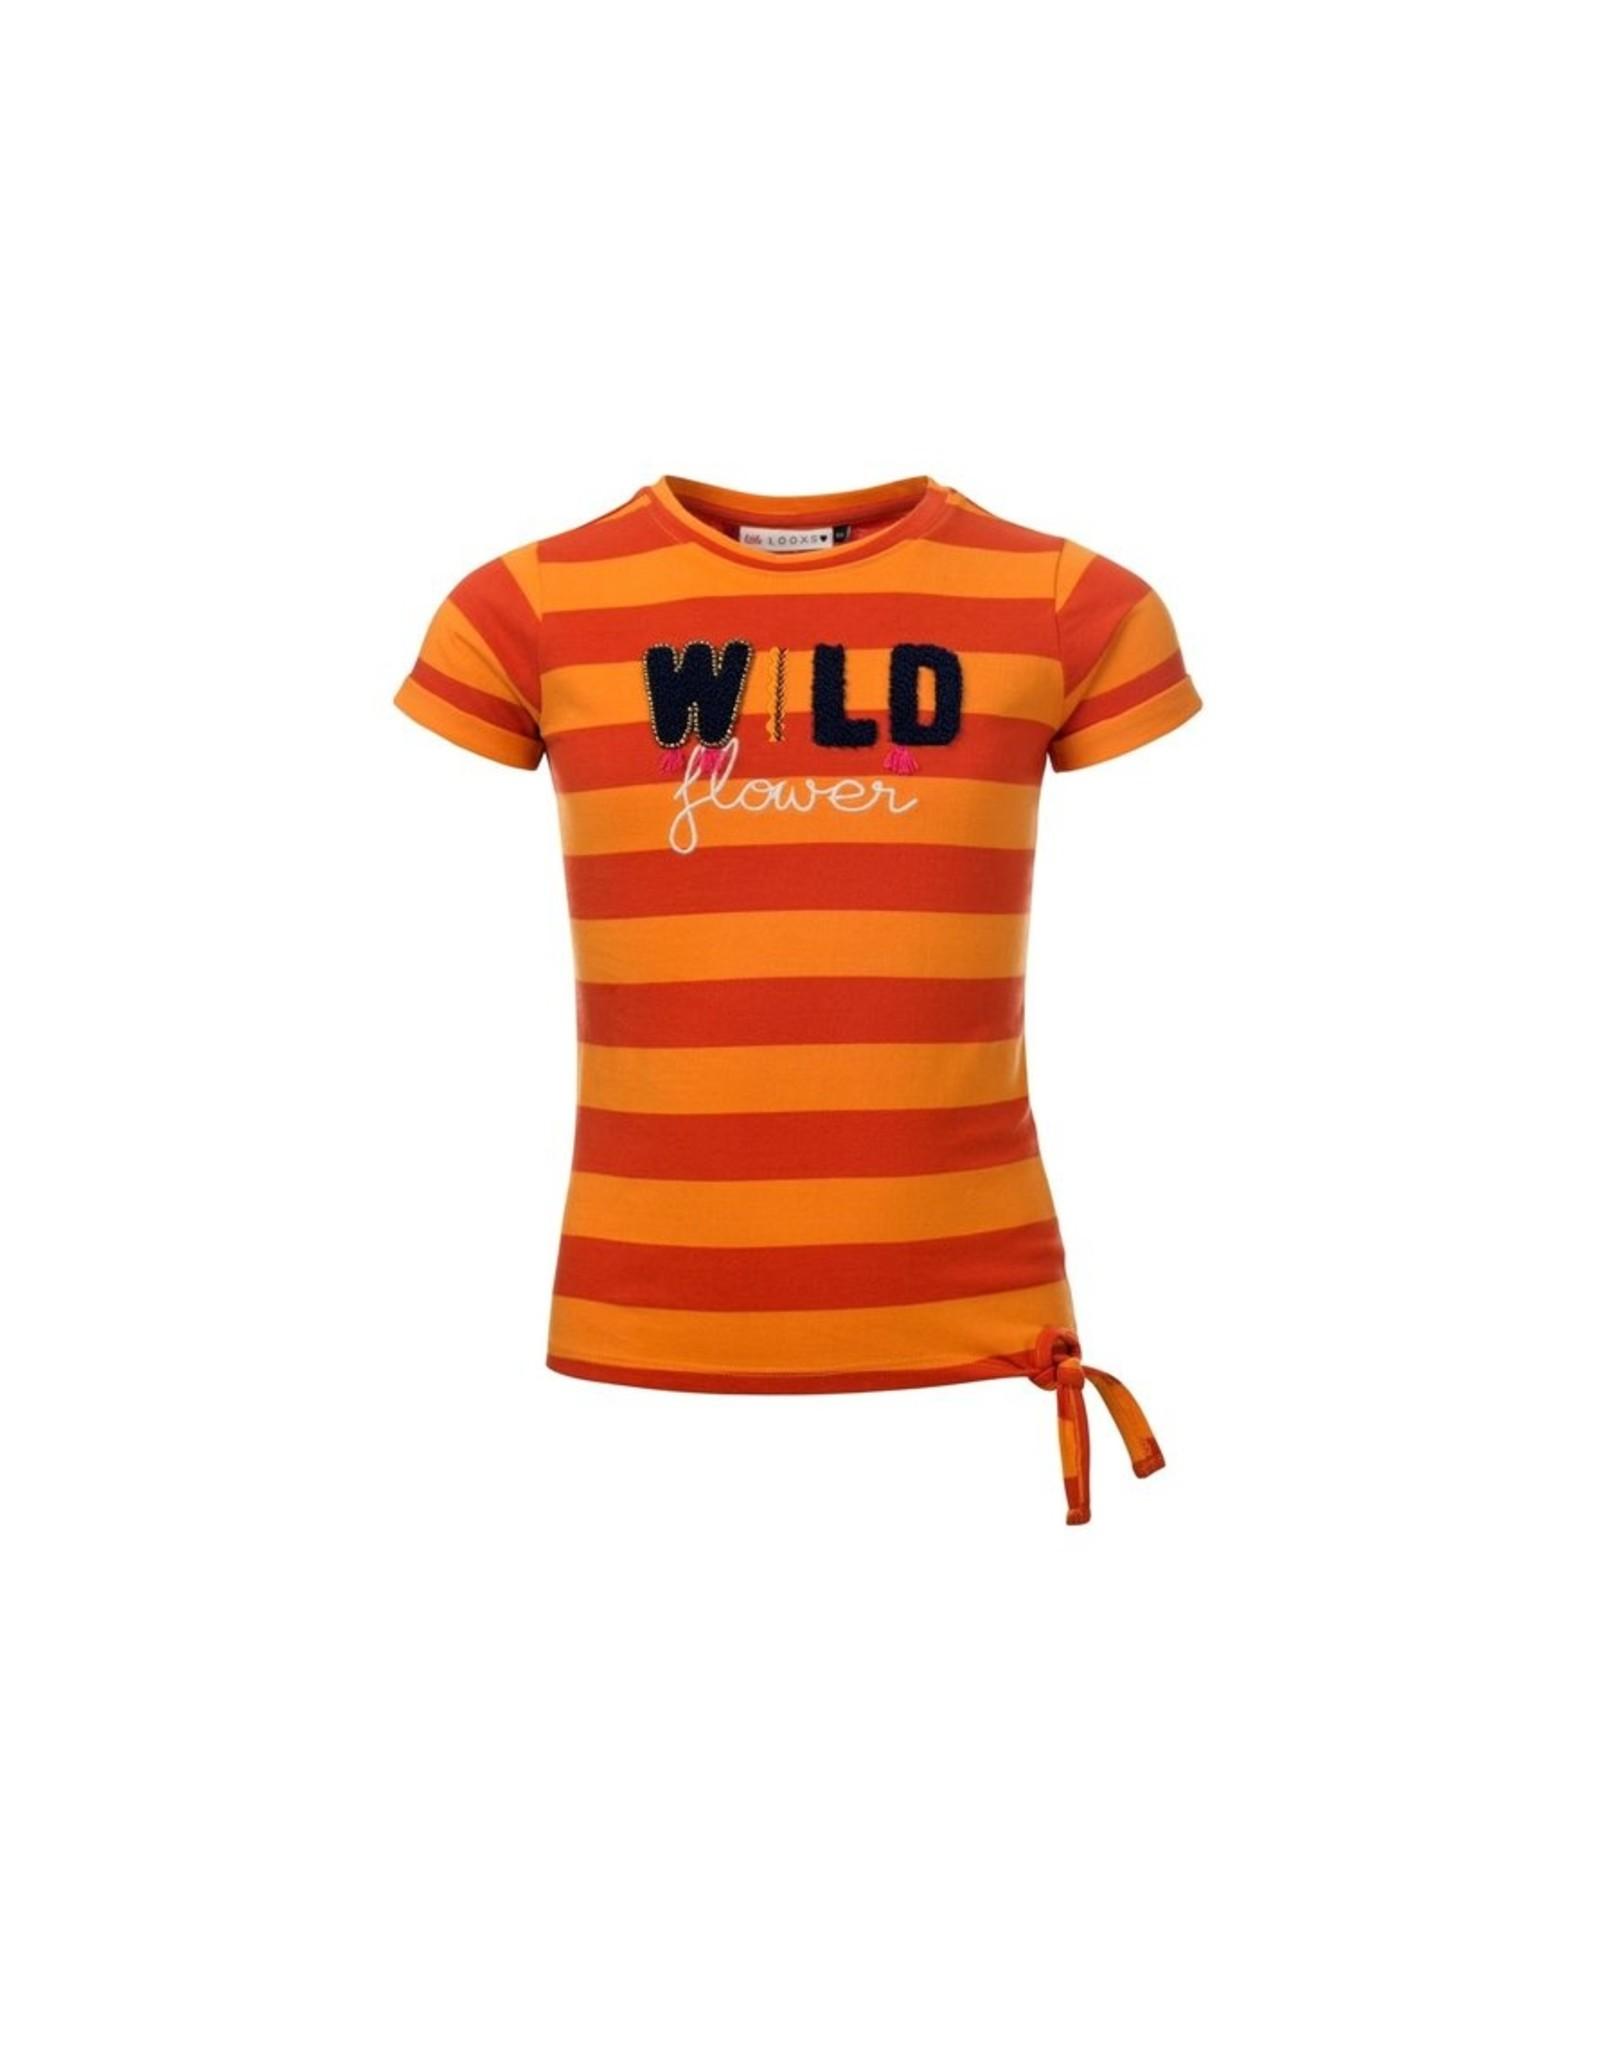 LOOXS Little Little t-shirt knot s. Sl, Antrastripe